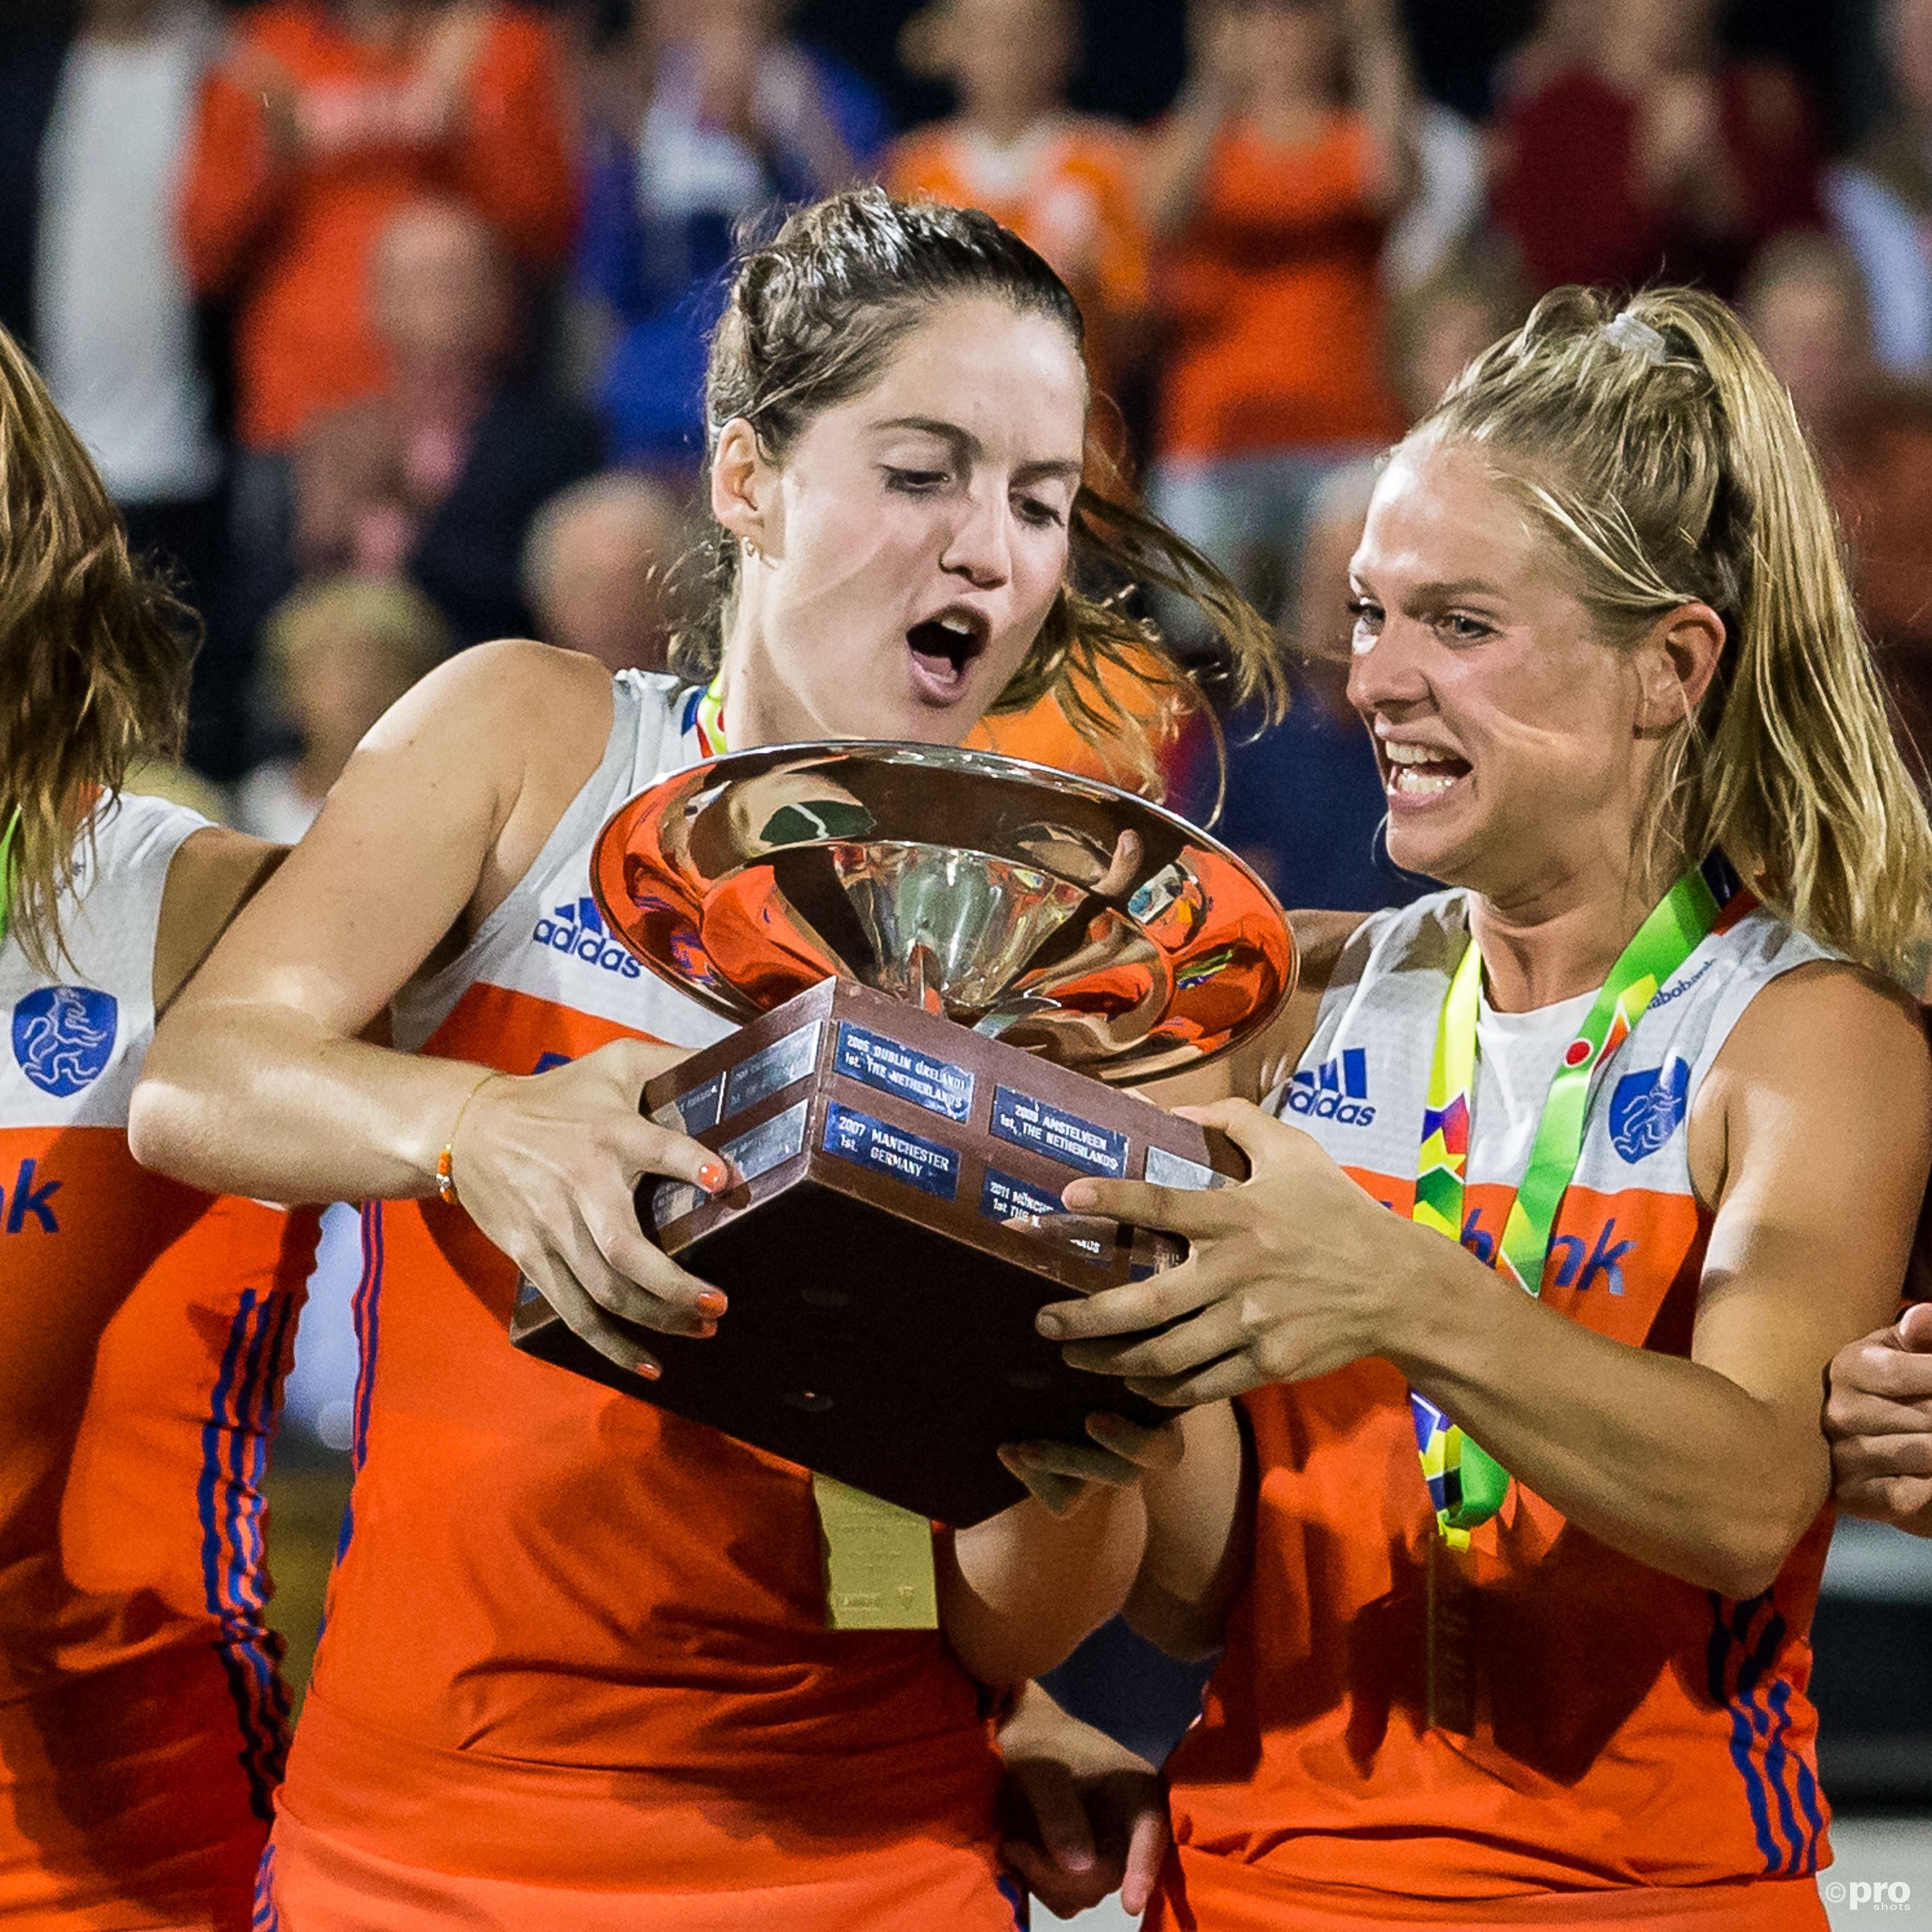 Nederlands elftal speelsters Marloes Ketels (l) en Kitty van Male met de beker. (PRO SHOTS/Dennis Wielders)